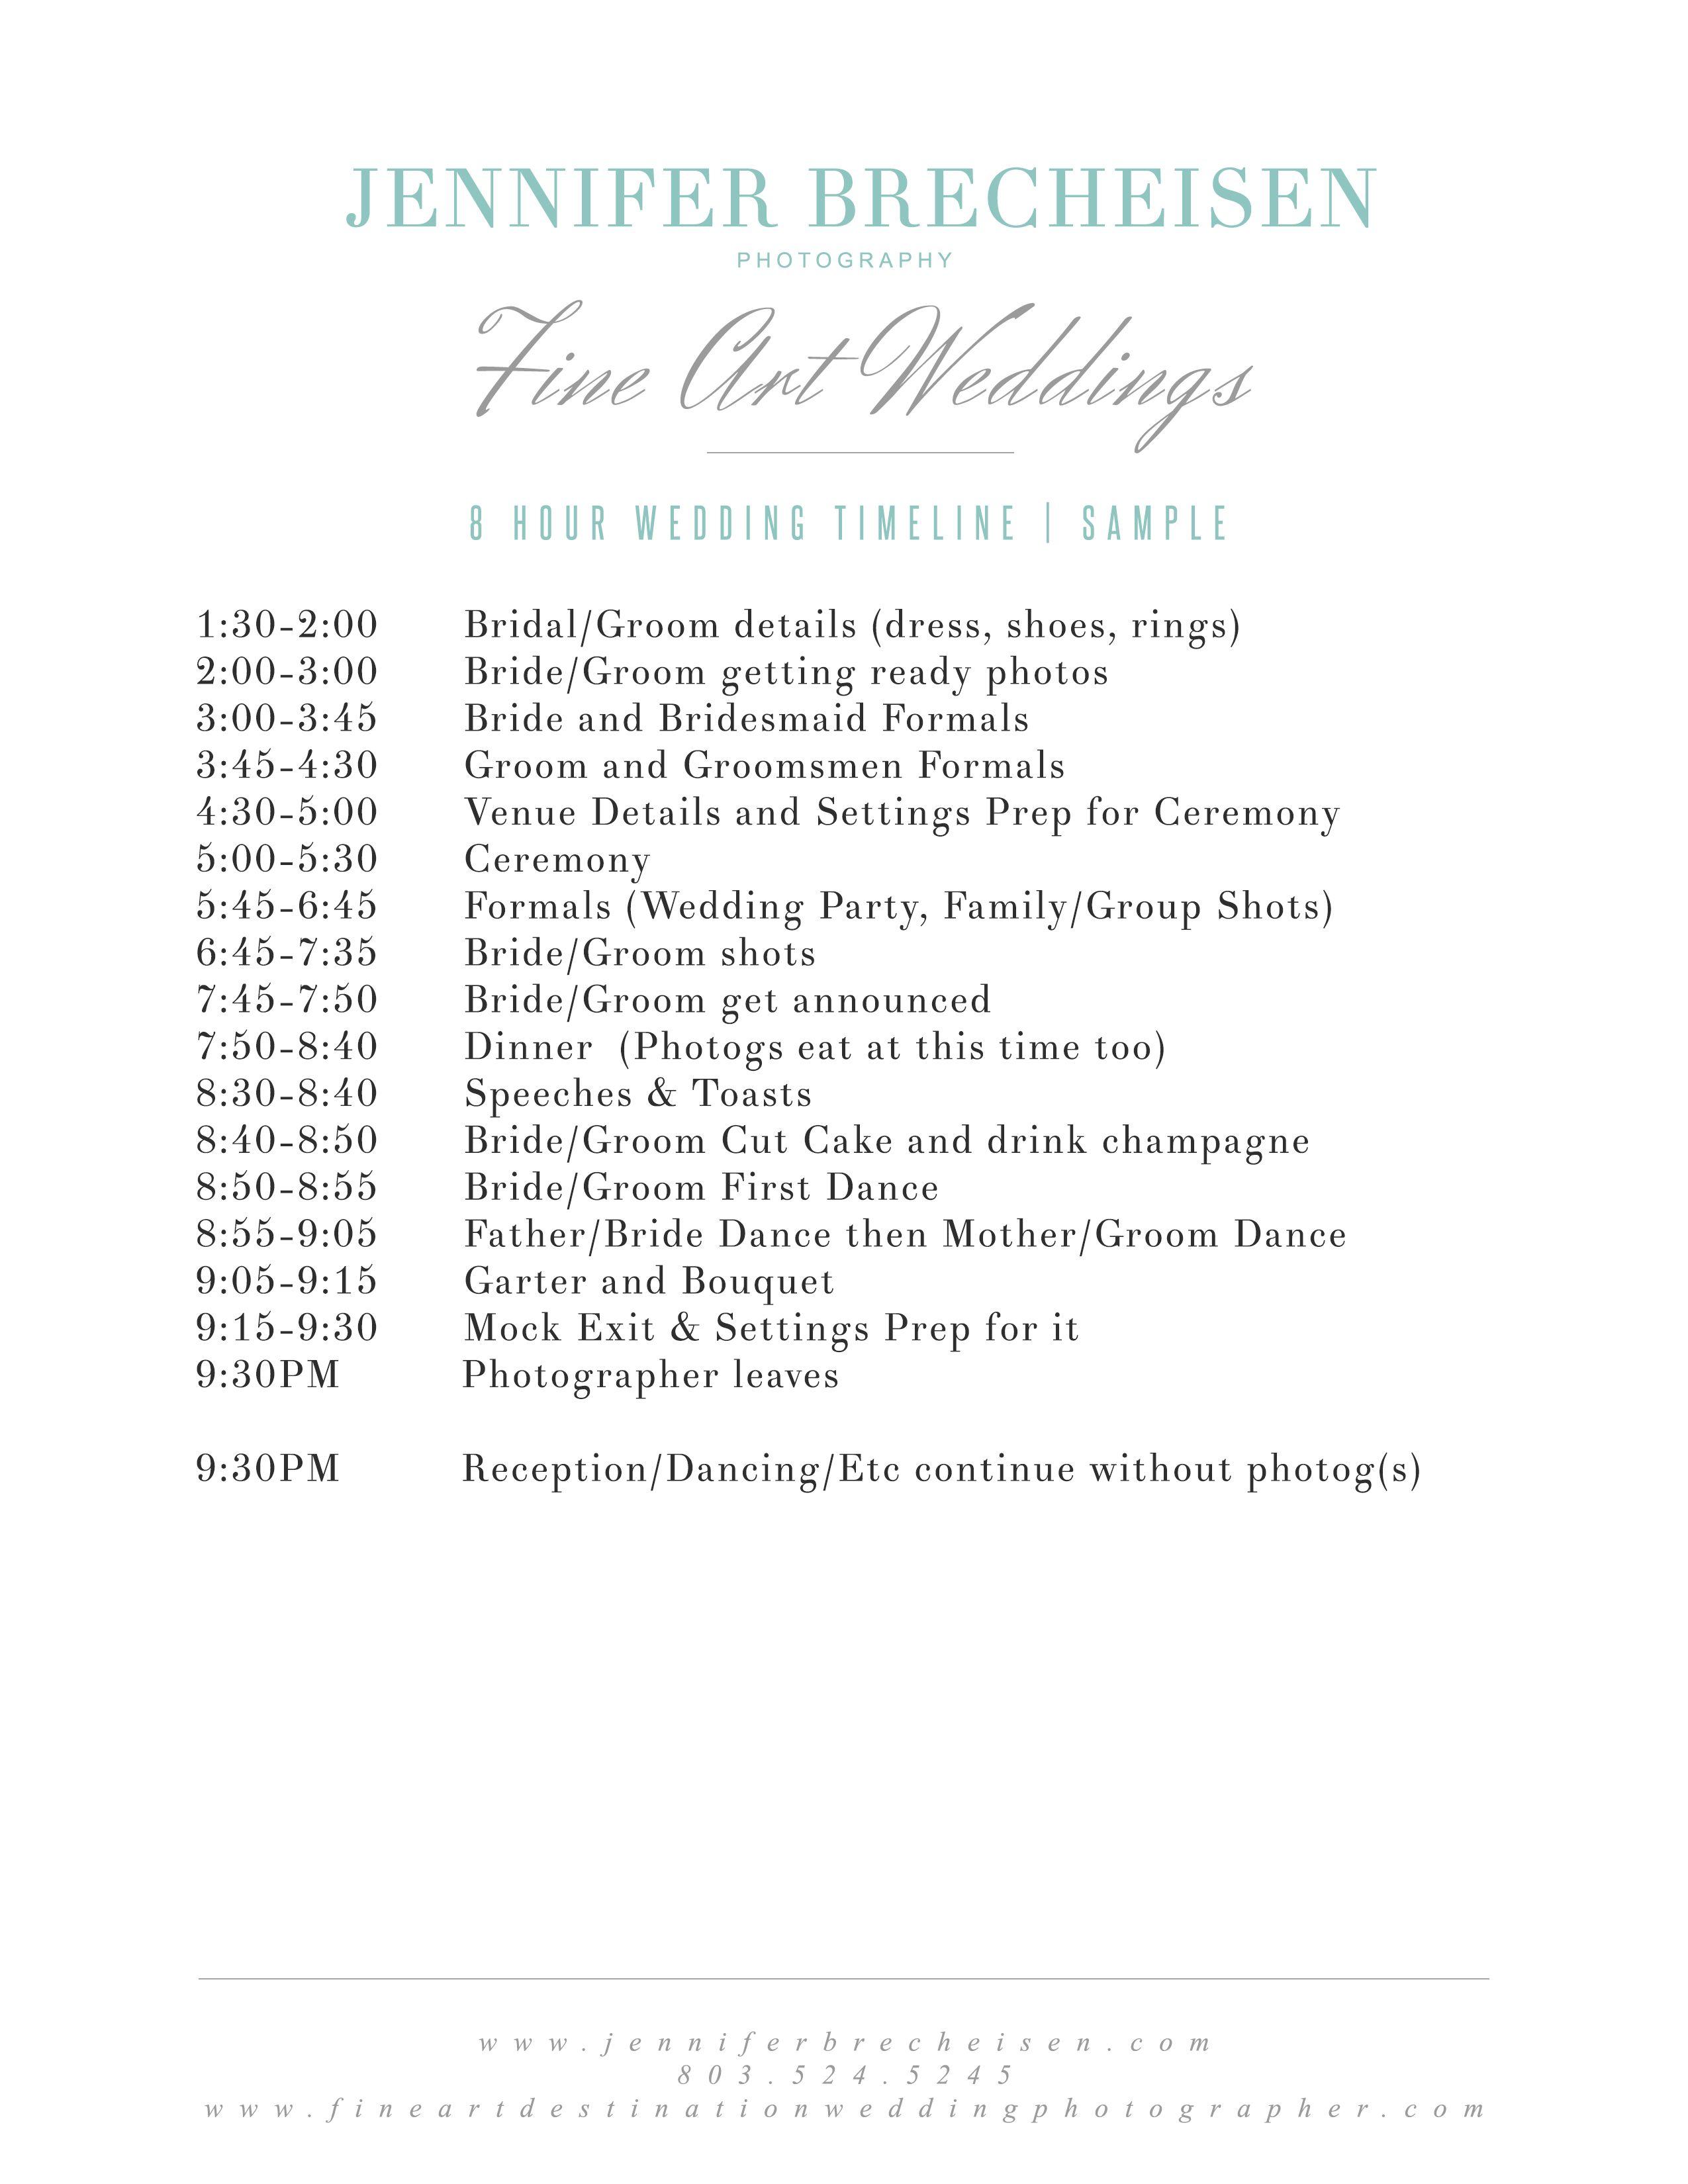 pin on wedding photography by jennifer brecheisen photographer charlotte asheville nc rock hill charleston sc savannah atlanta ga destination adventure fine art